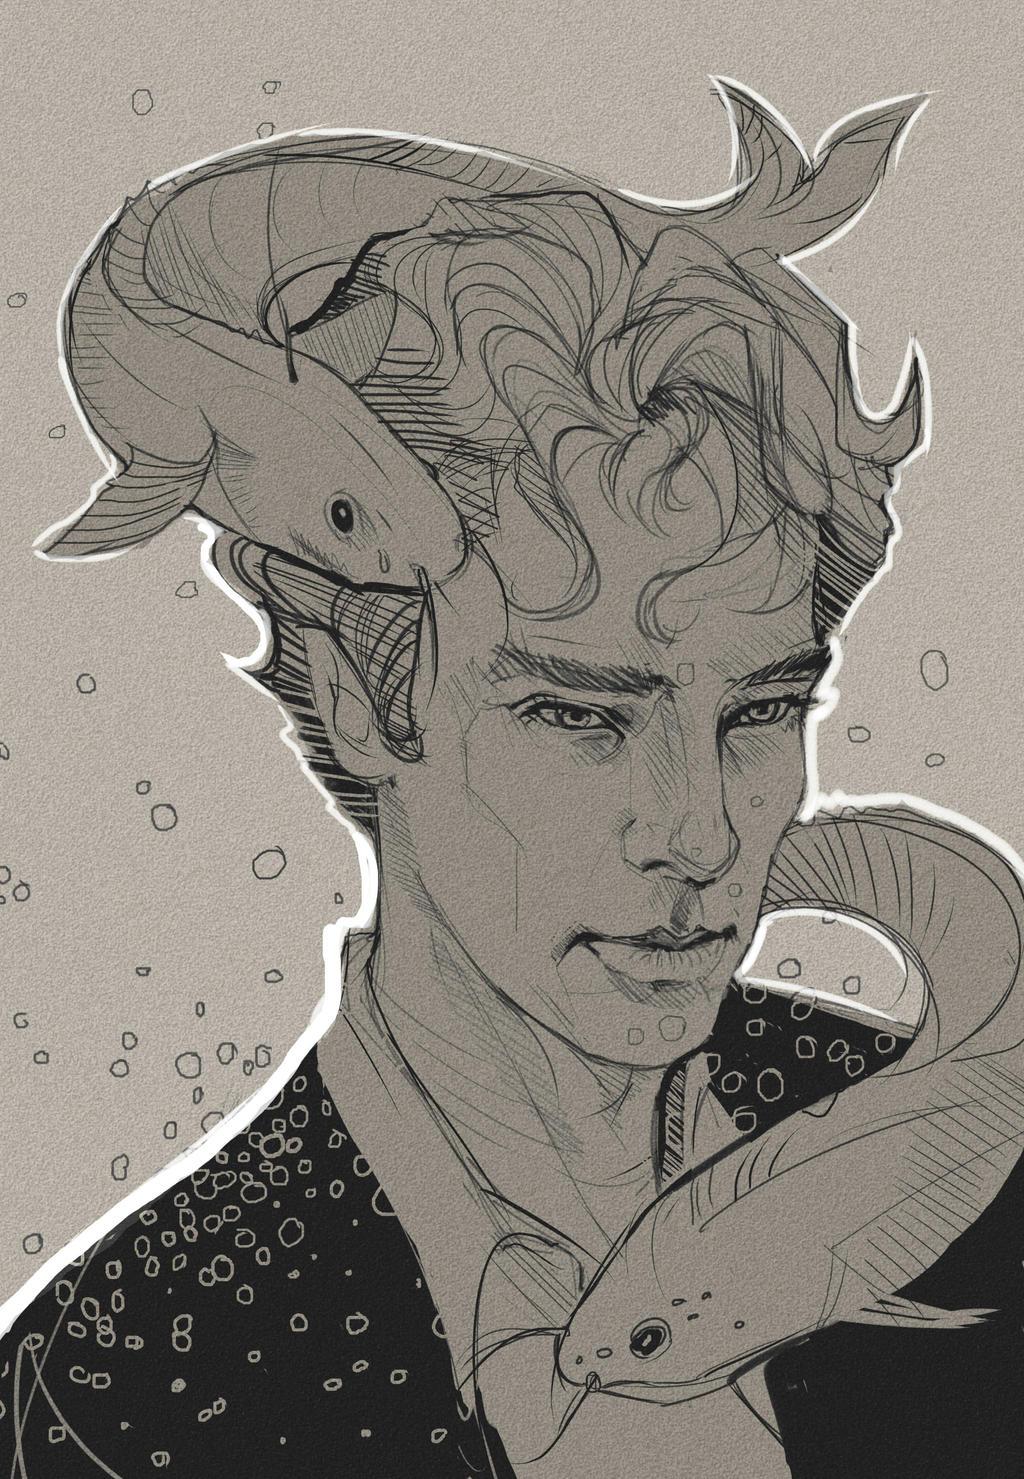 Sherlock BBC 2 by Bran1313